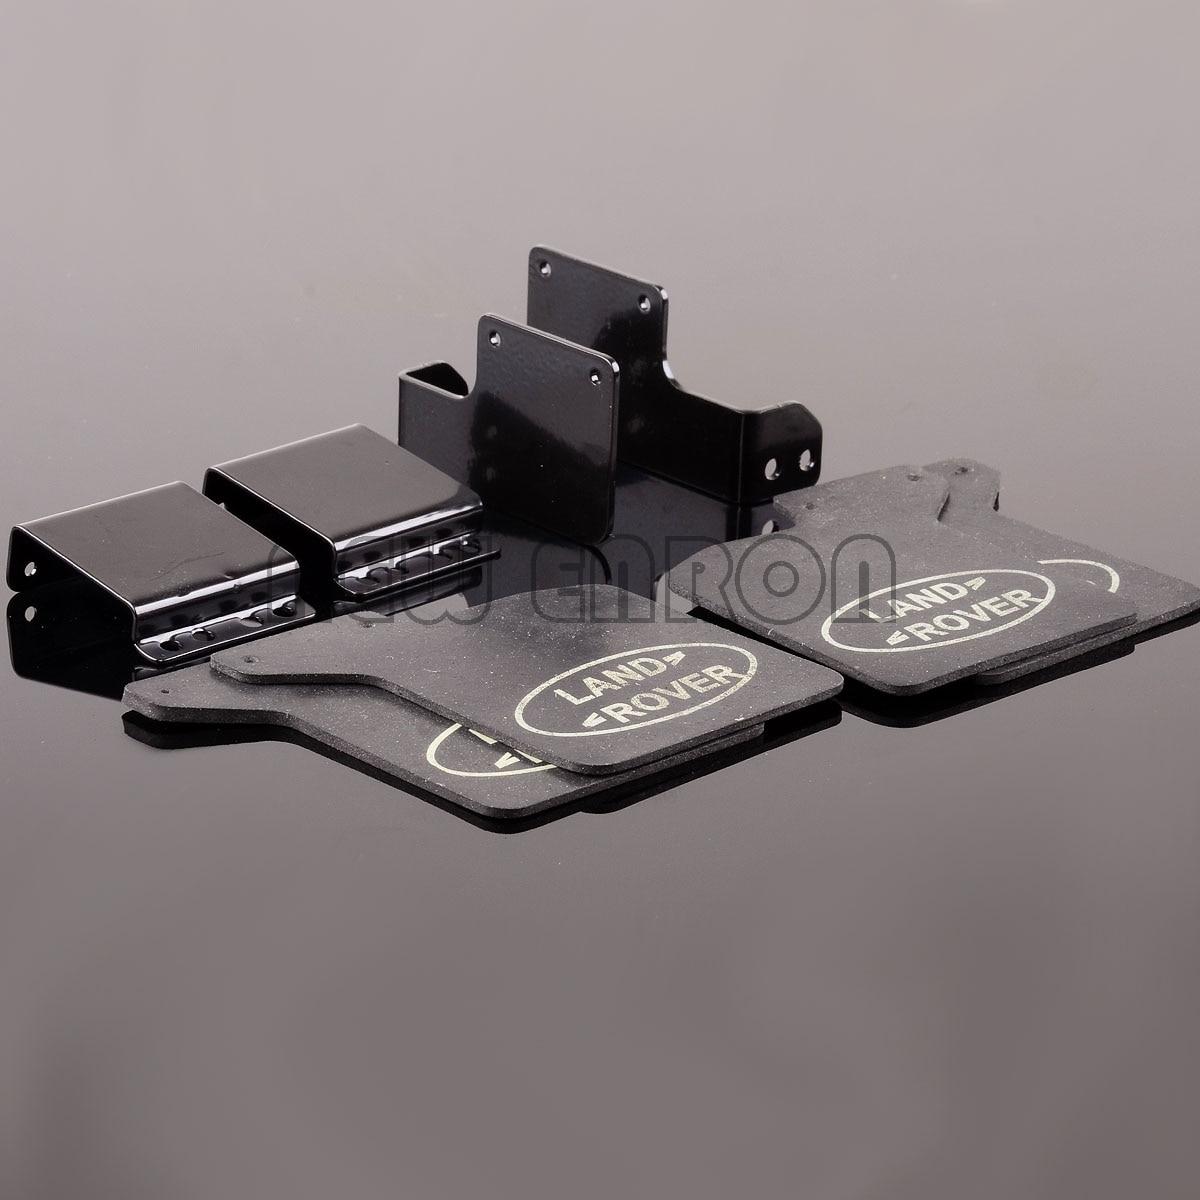 NEW ENRON  Rubber Quarters F & R Fender Mud Flaps  For 1/10 RC Crawler Traxxas TRX-4 D110